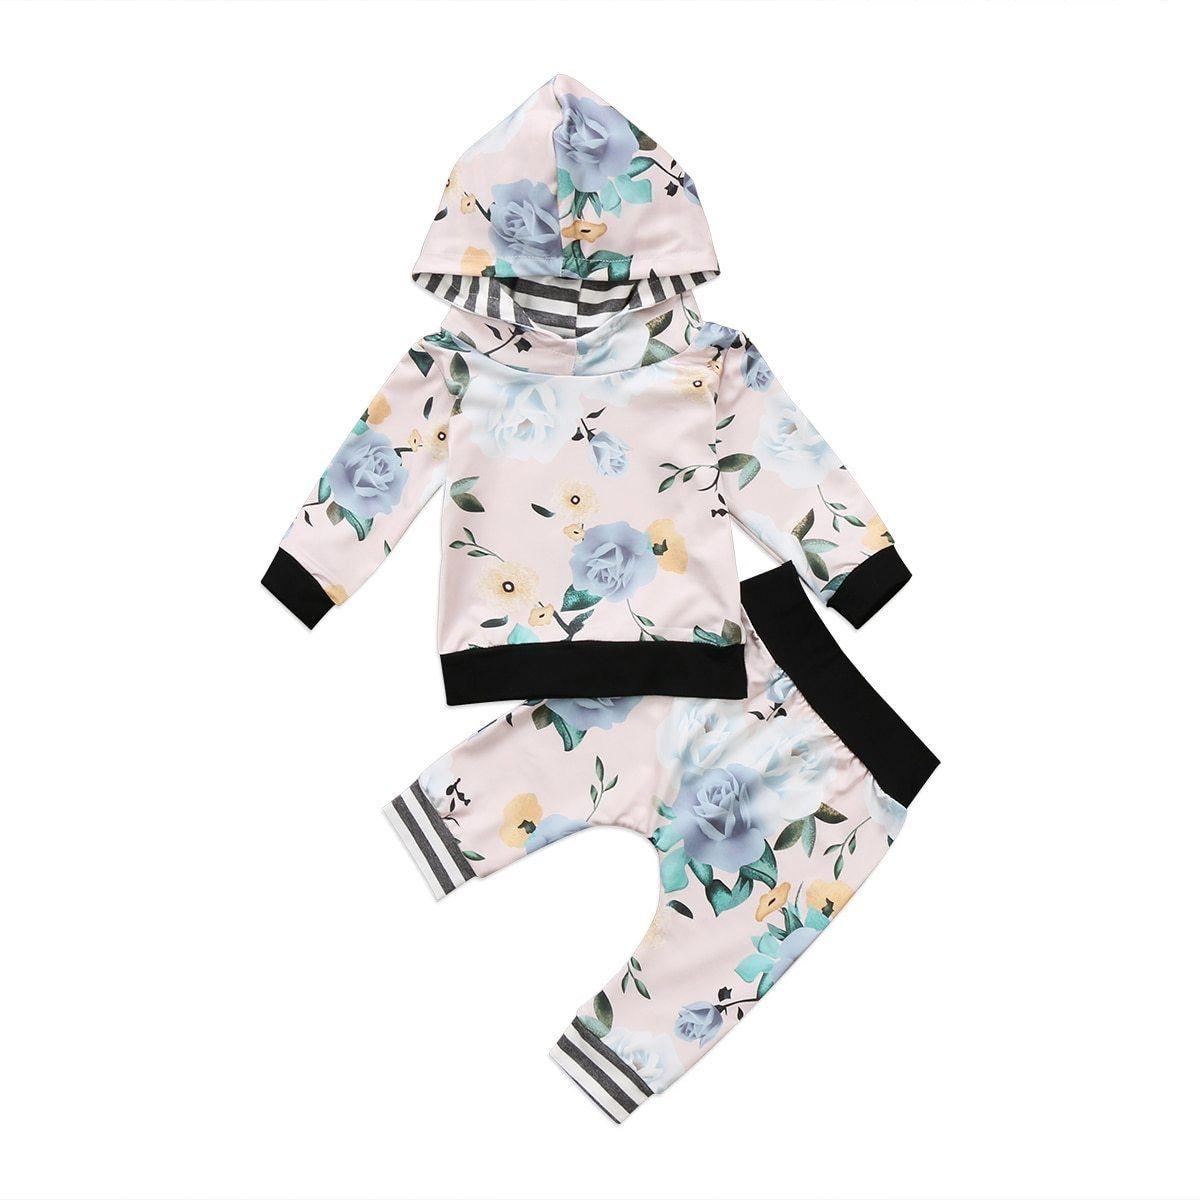 Exemaba Unisex Baby Winter Shoes Infant Toddler Girls Boys Indoor Prewalker Crib Shoes Warm Booties Anti-Slip Slippers Socks